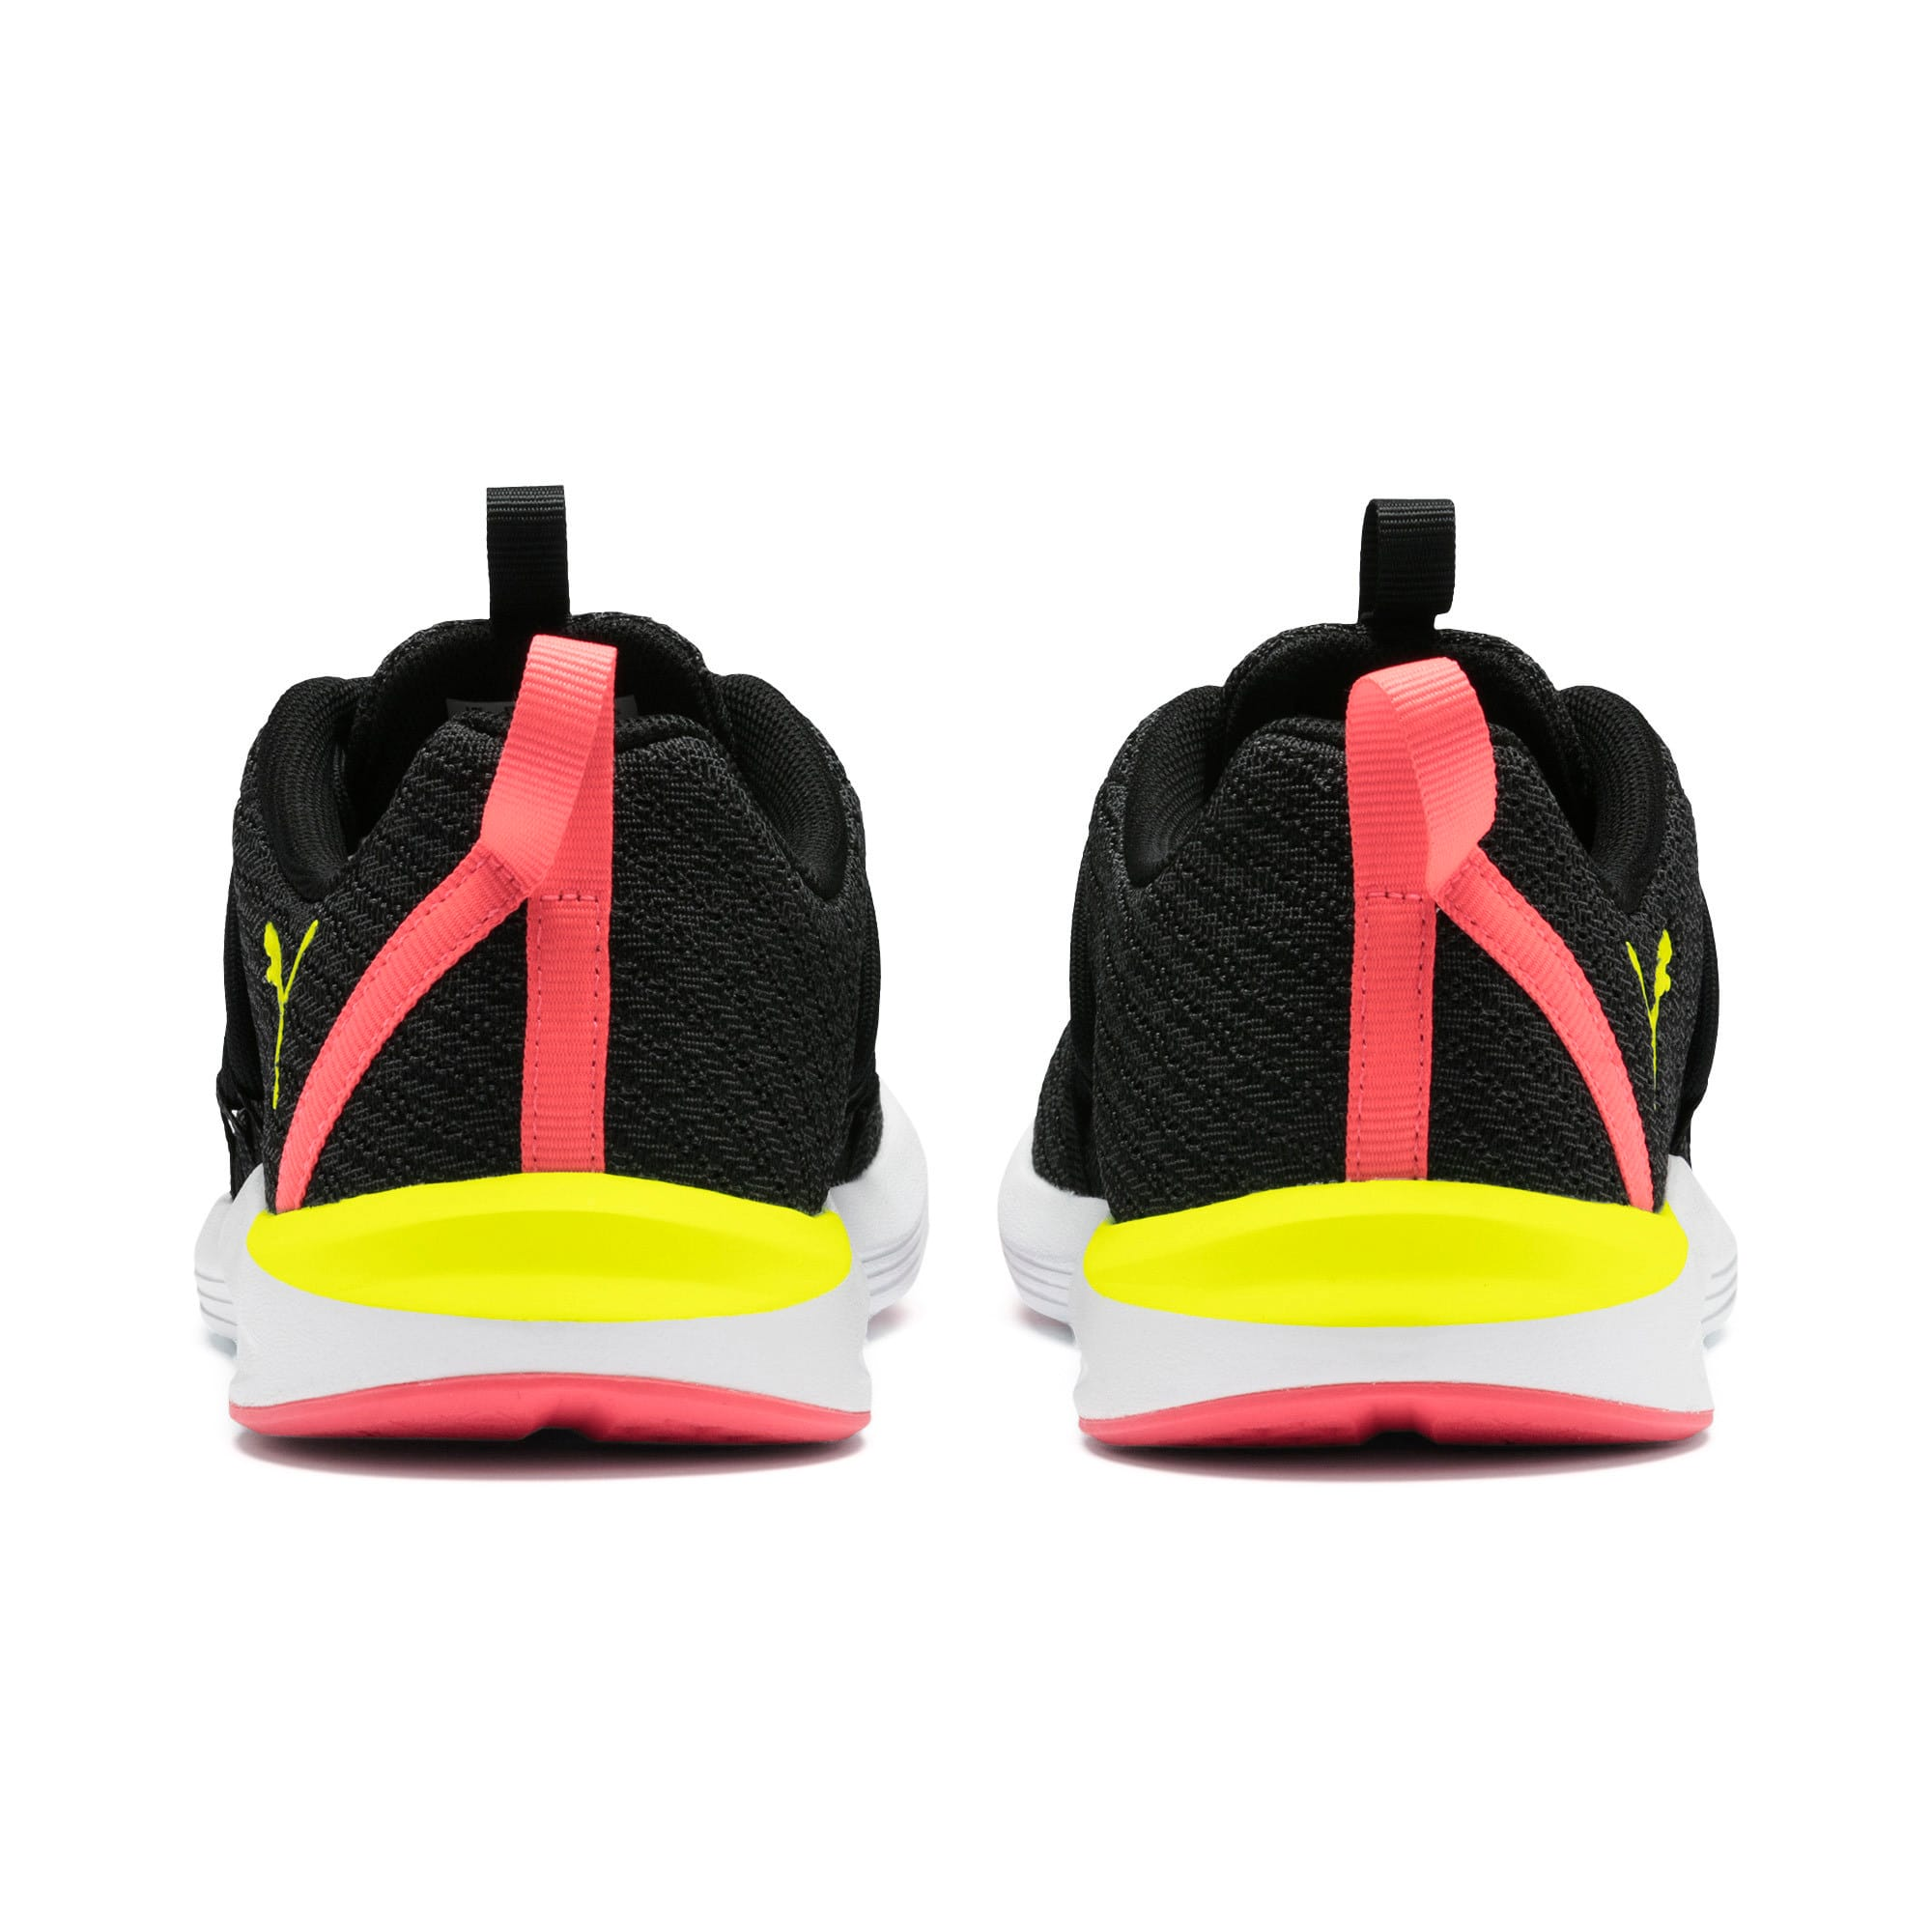 Imagen en miniatura 4 de Zapatillas de mujer Prowl Alt Neon, Puma Black-Yellow Alert, mediana